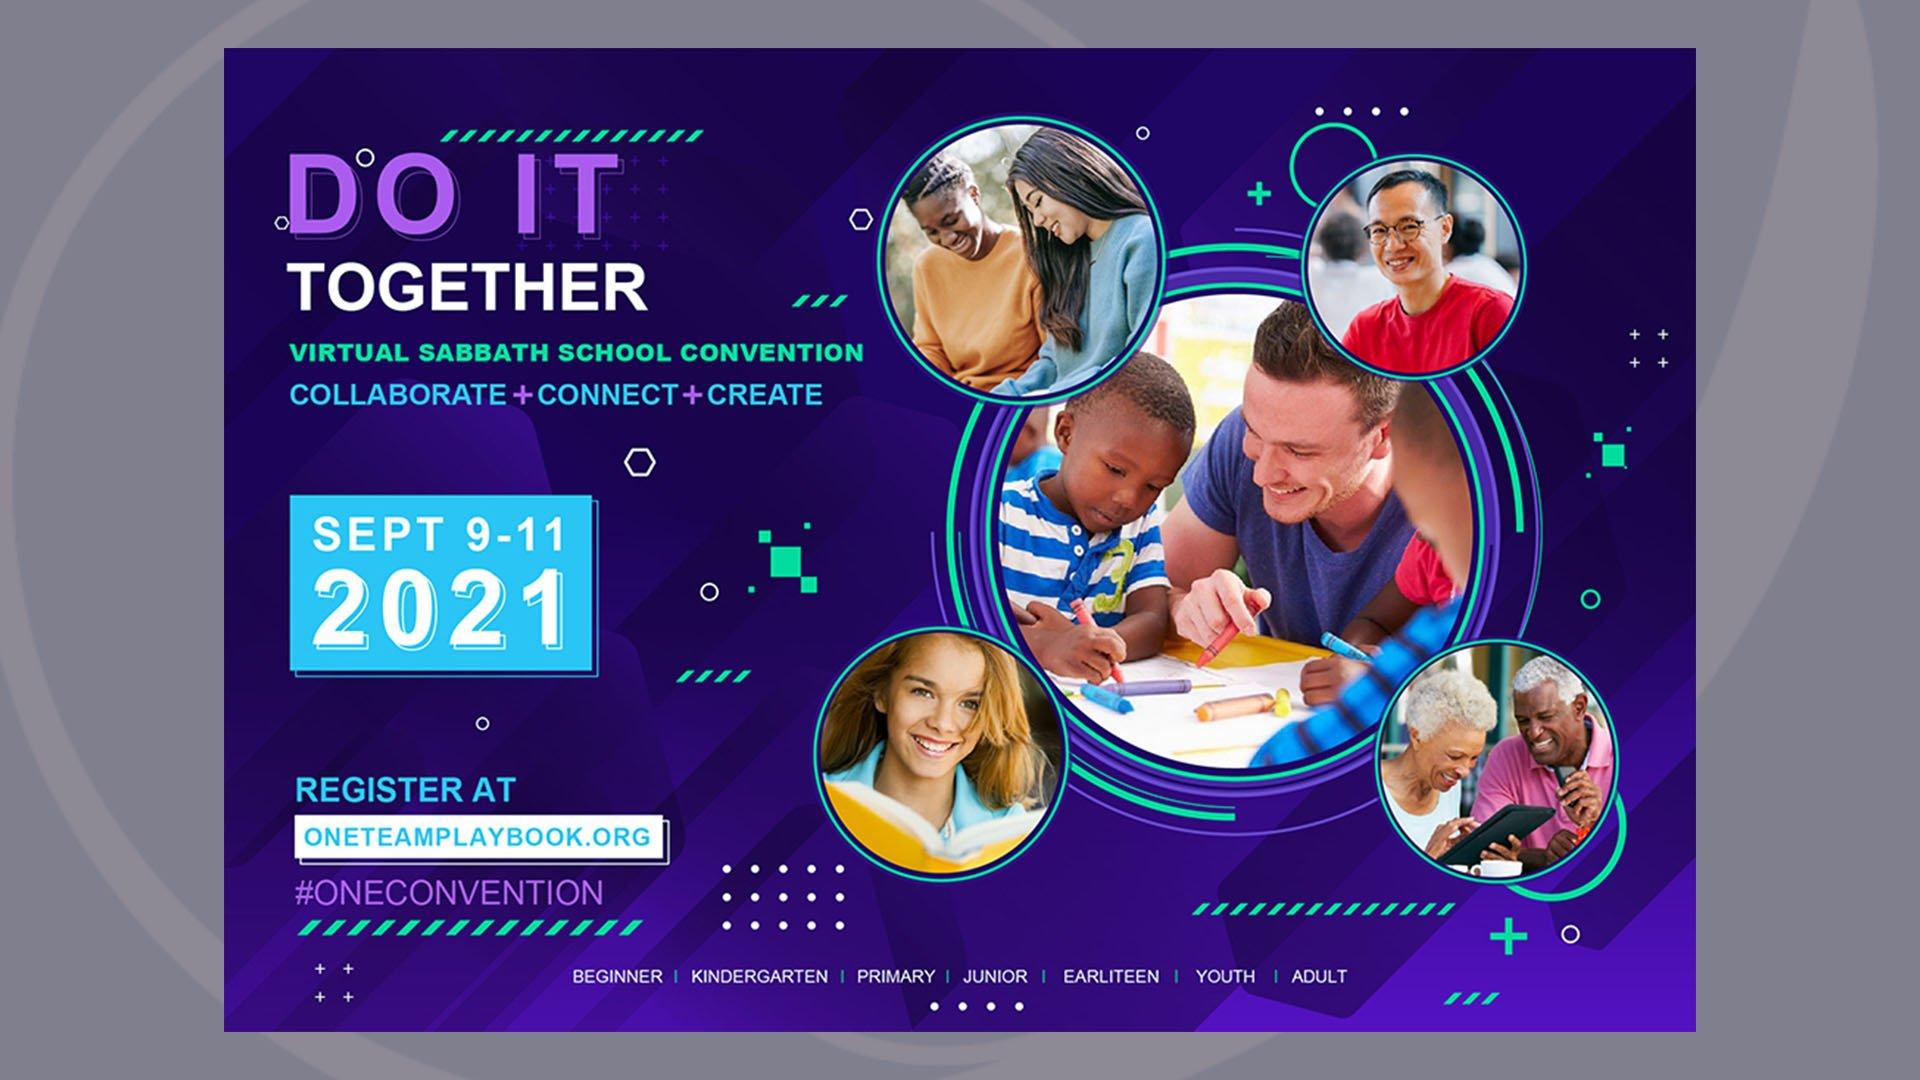 Do It Together Sabbath School Convention